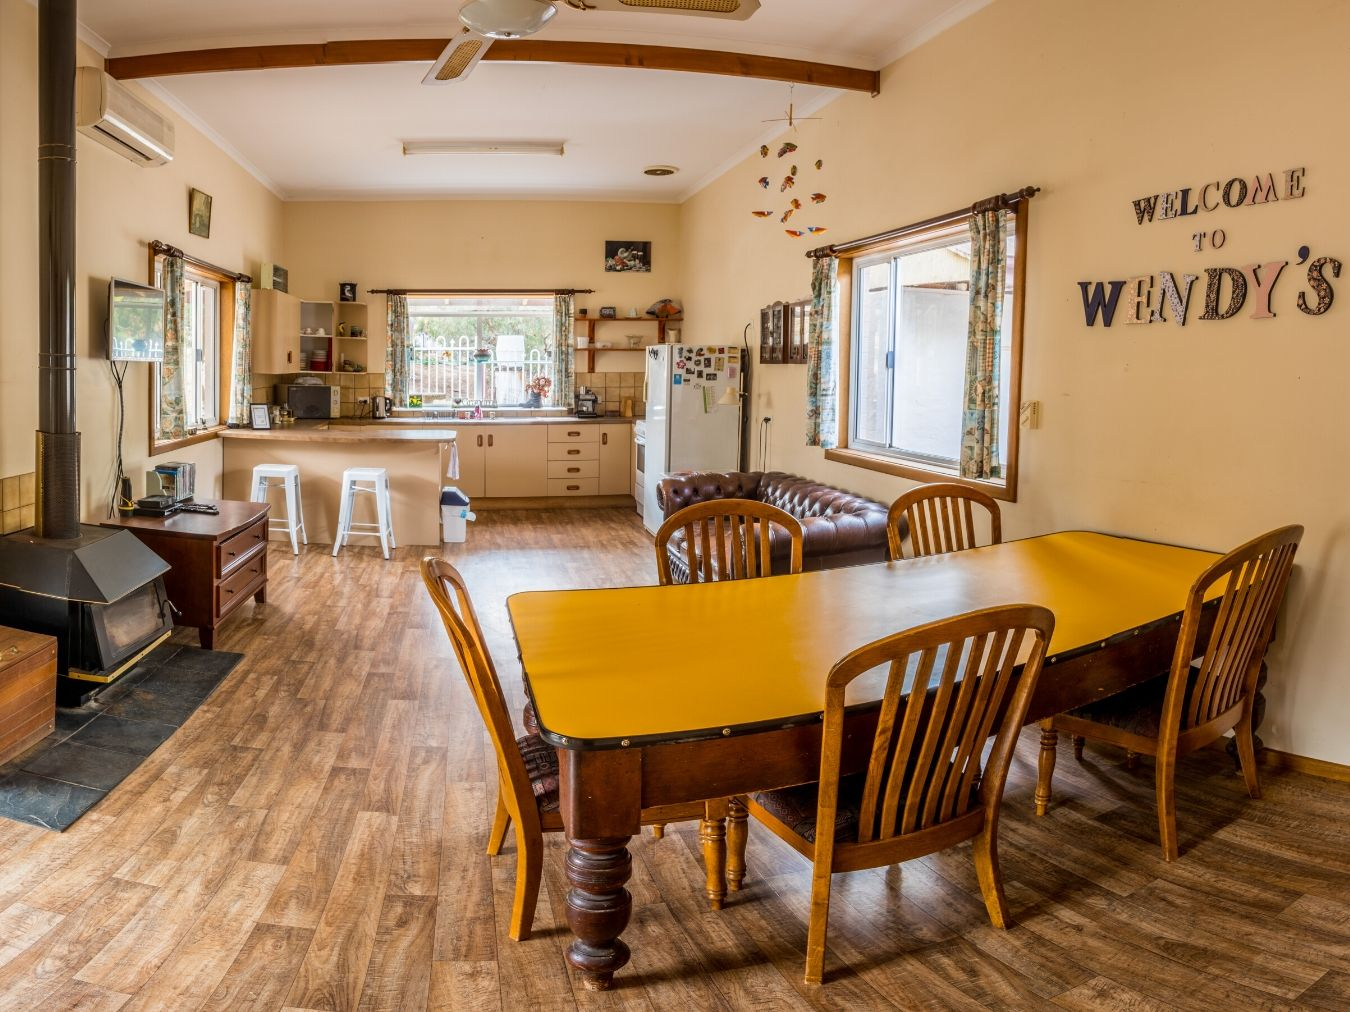 attle-Park-Wendys-Flinders-Ranges-Accommodation-5